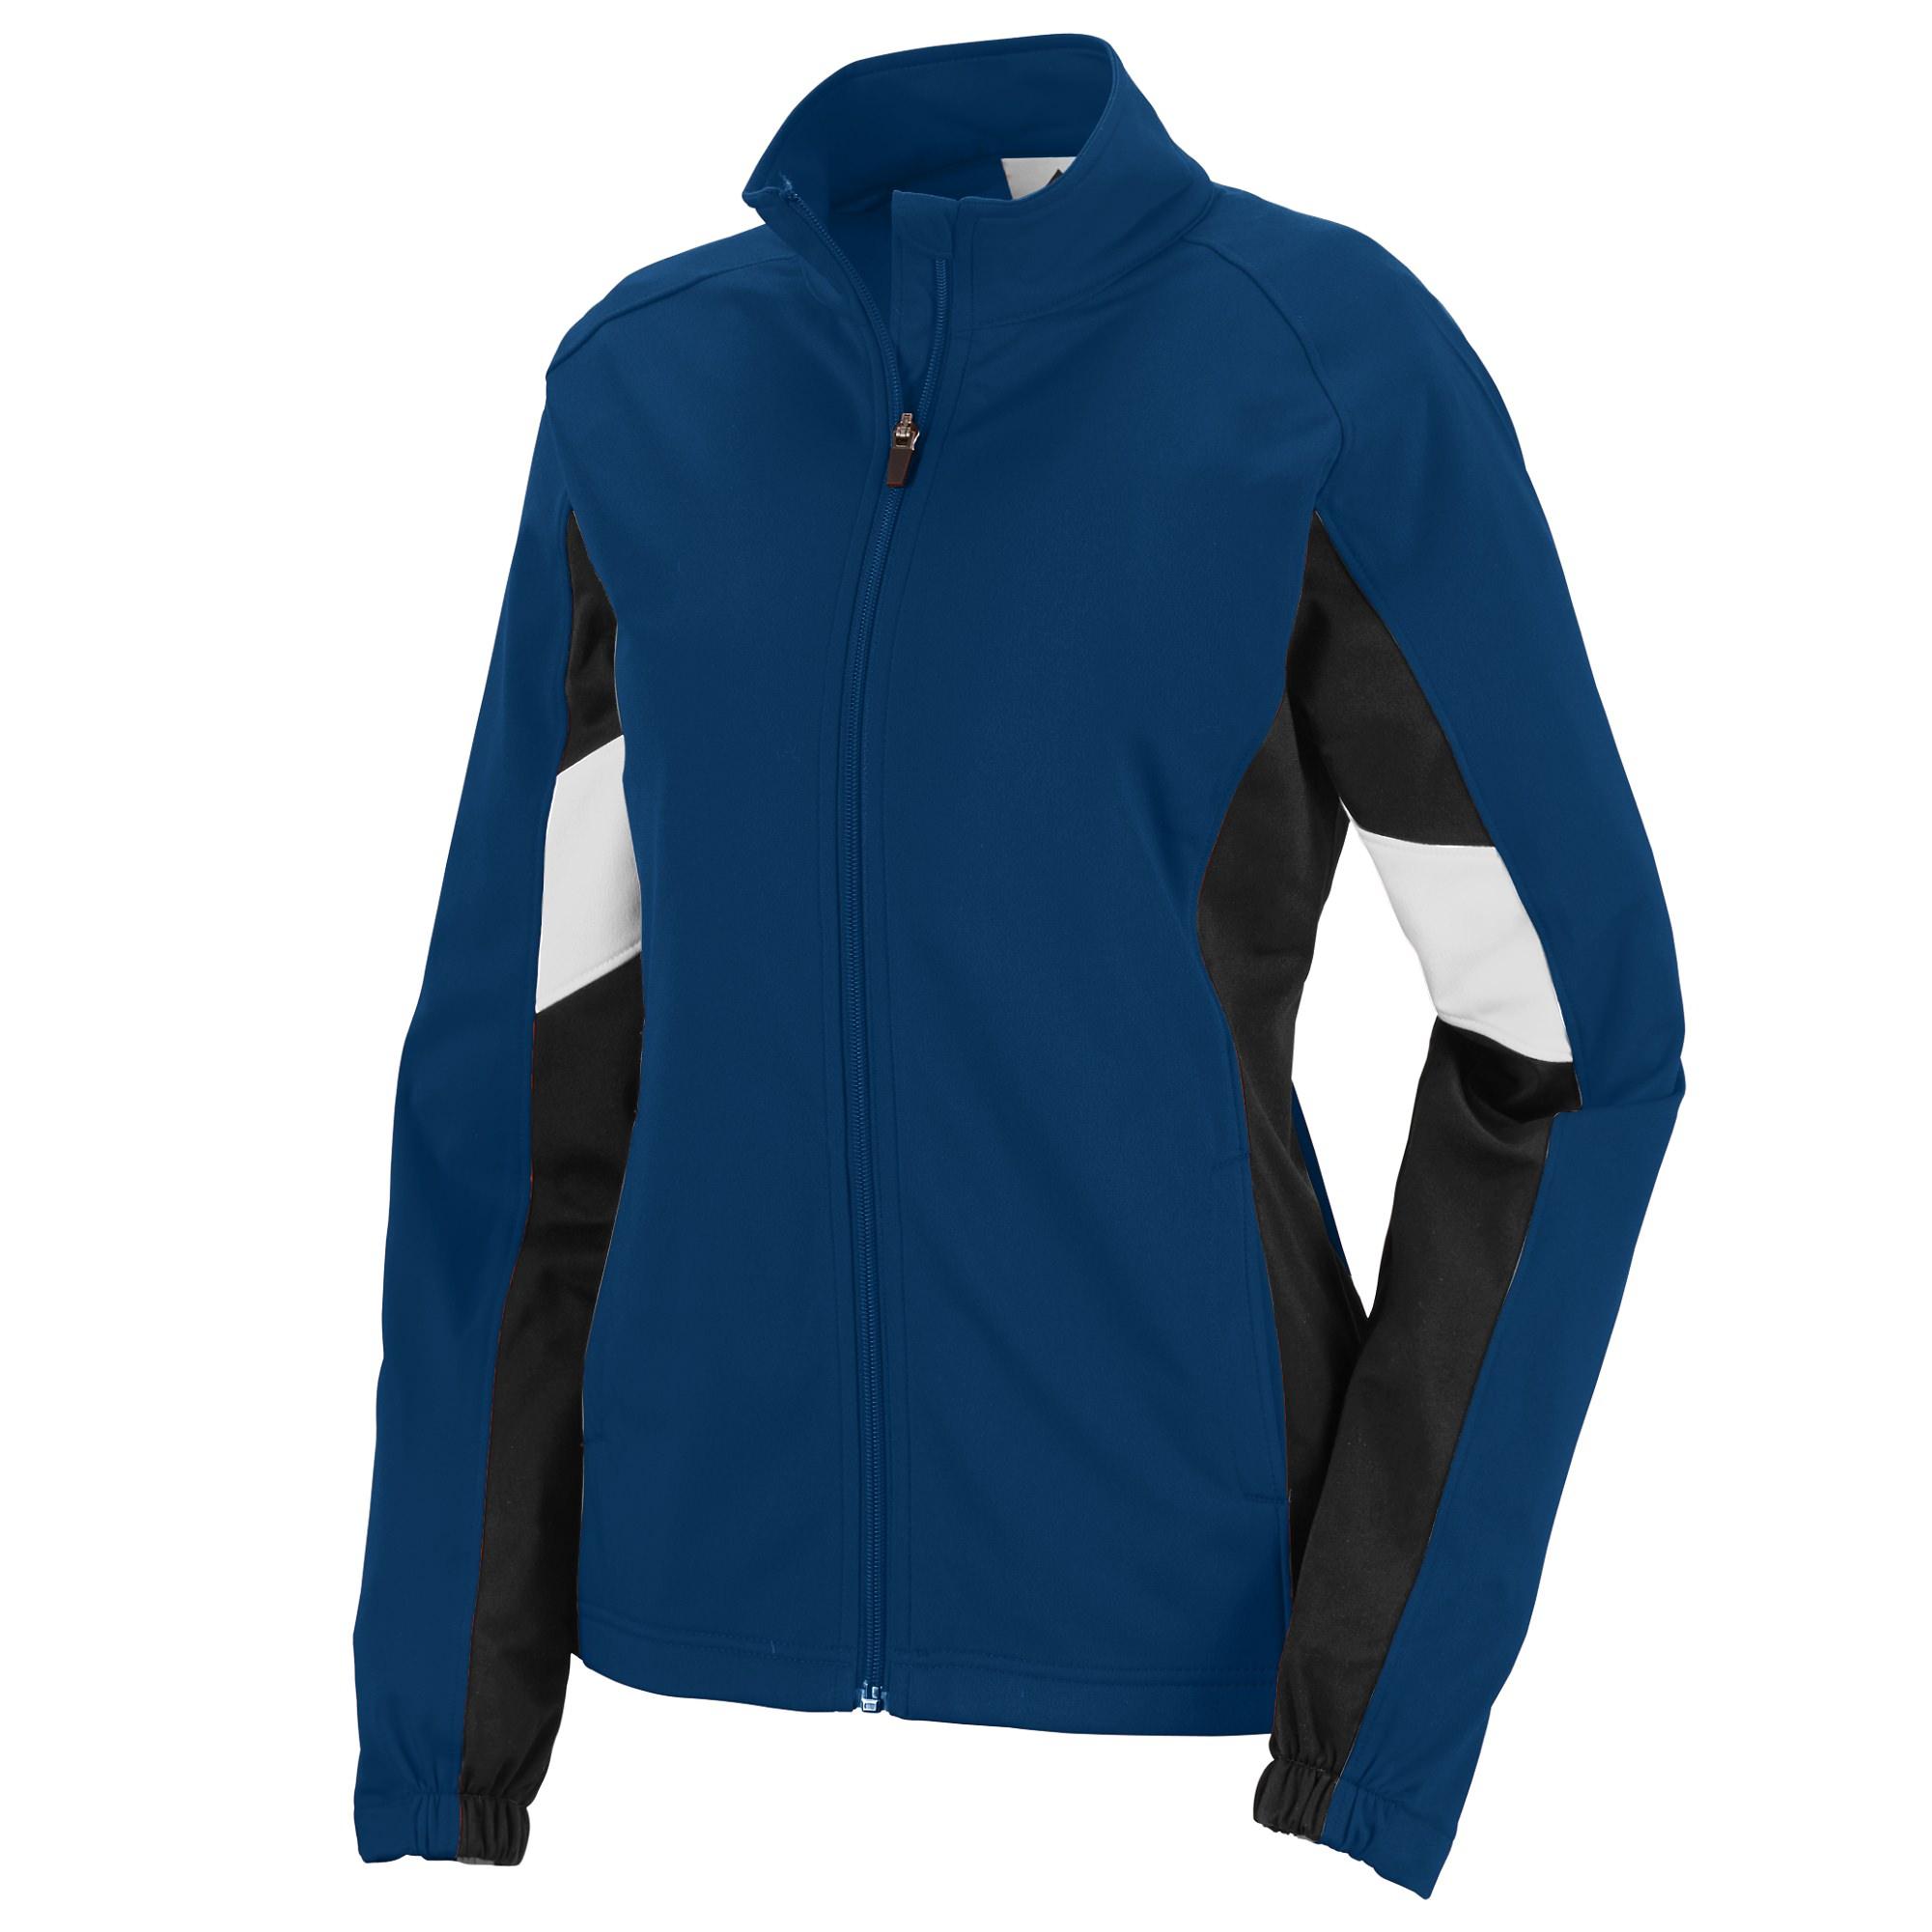 Style 7724 Jacket (Ladies)